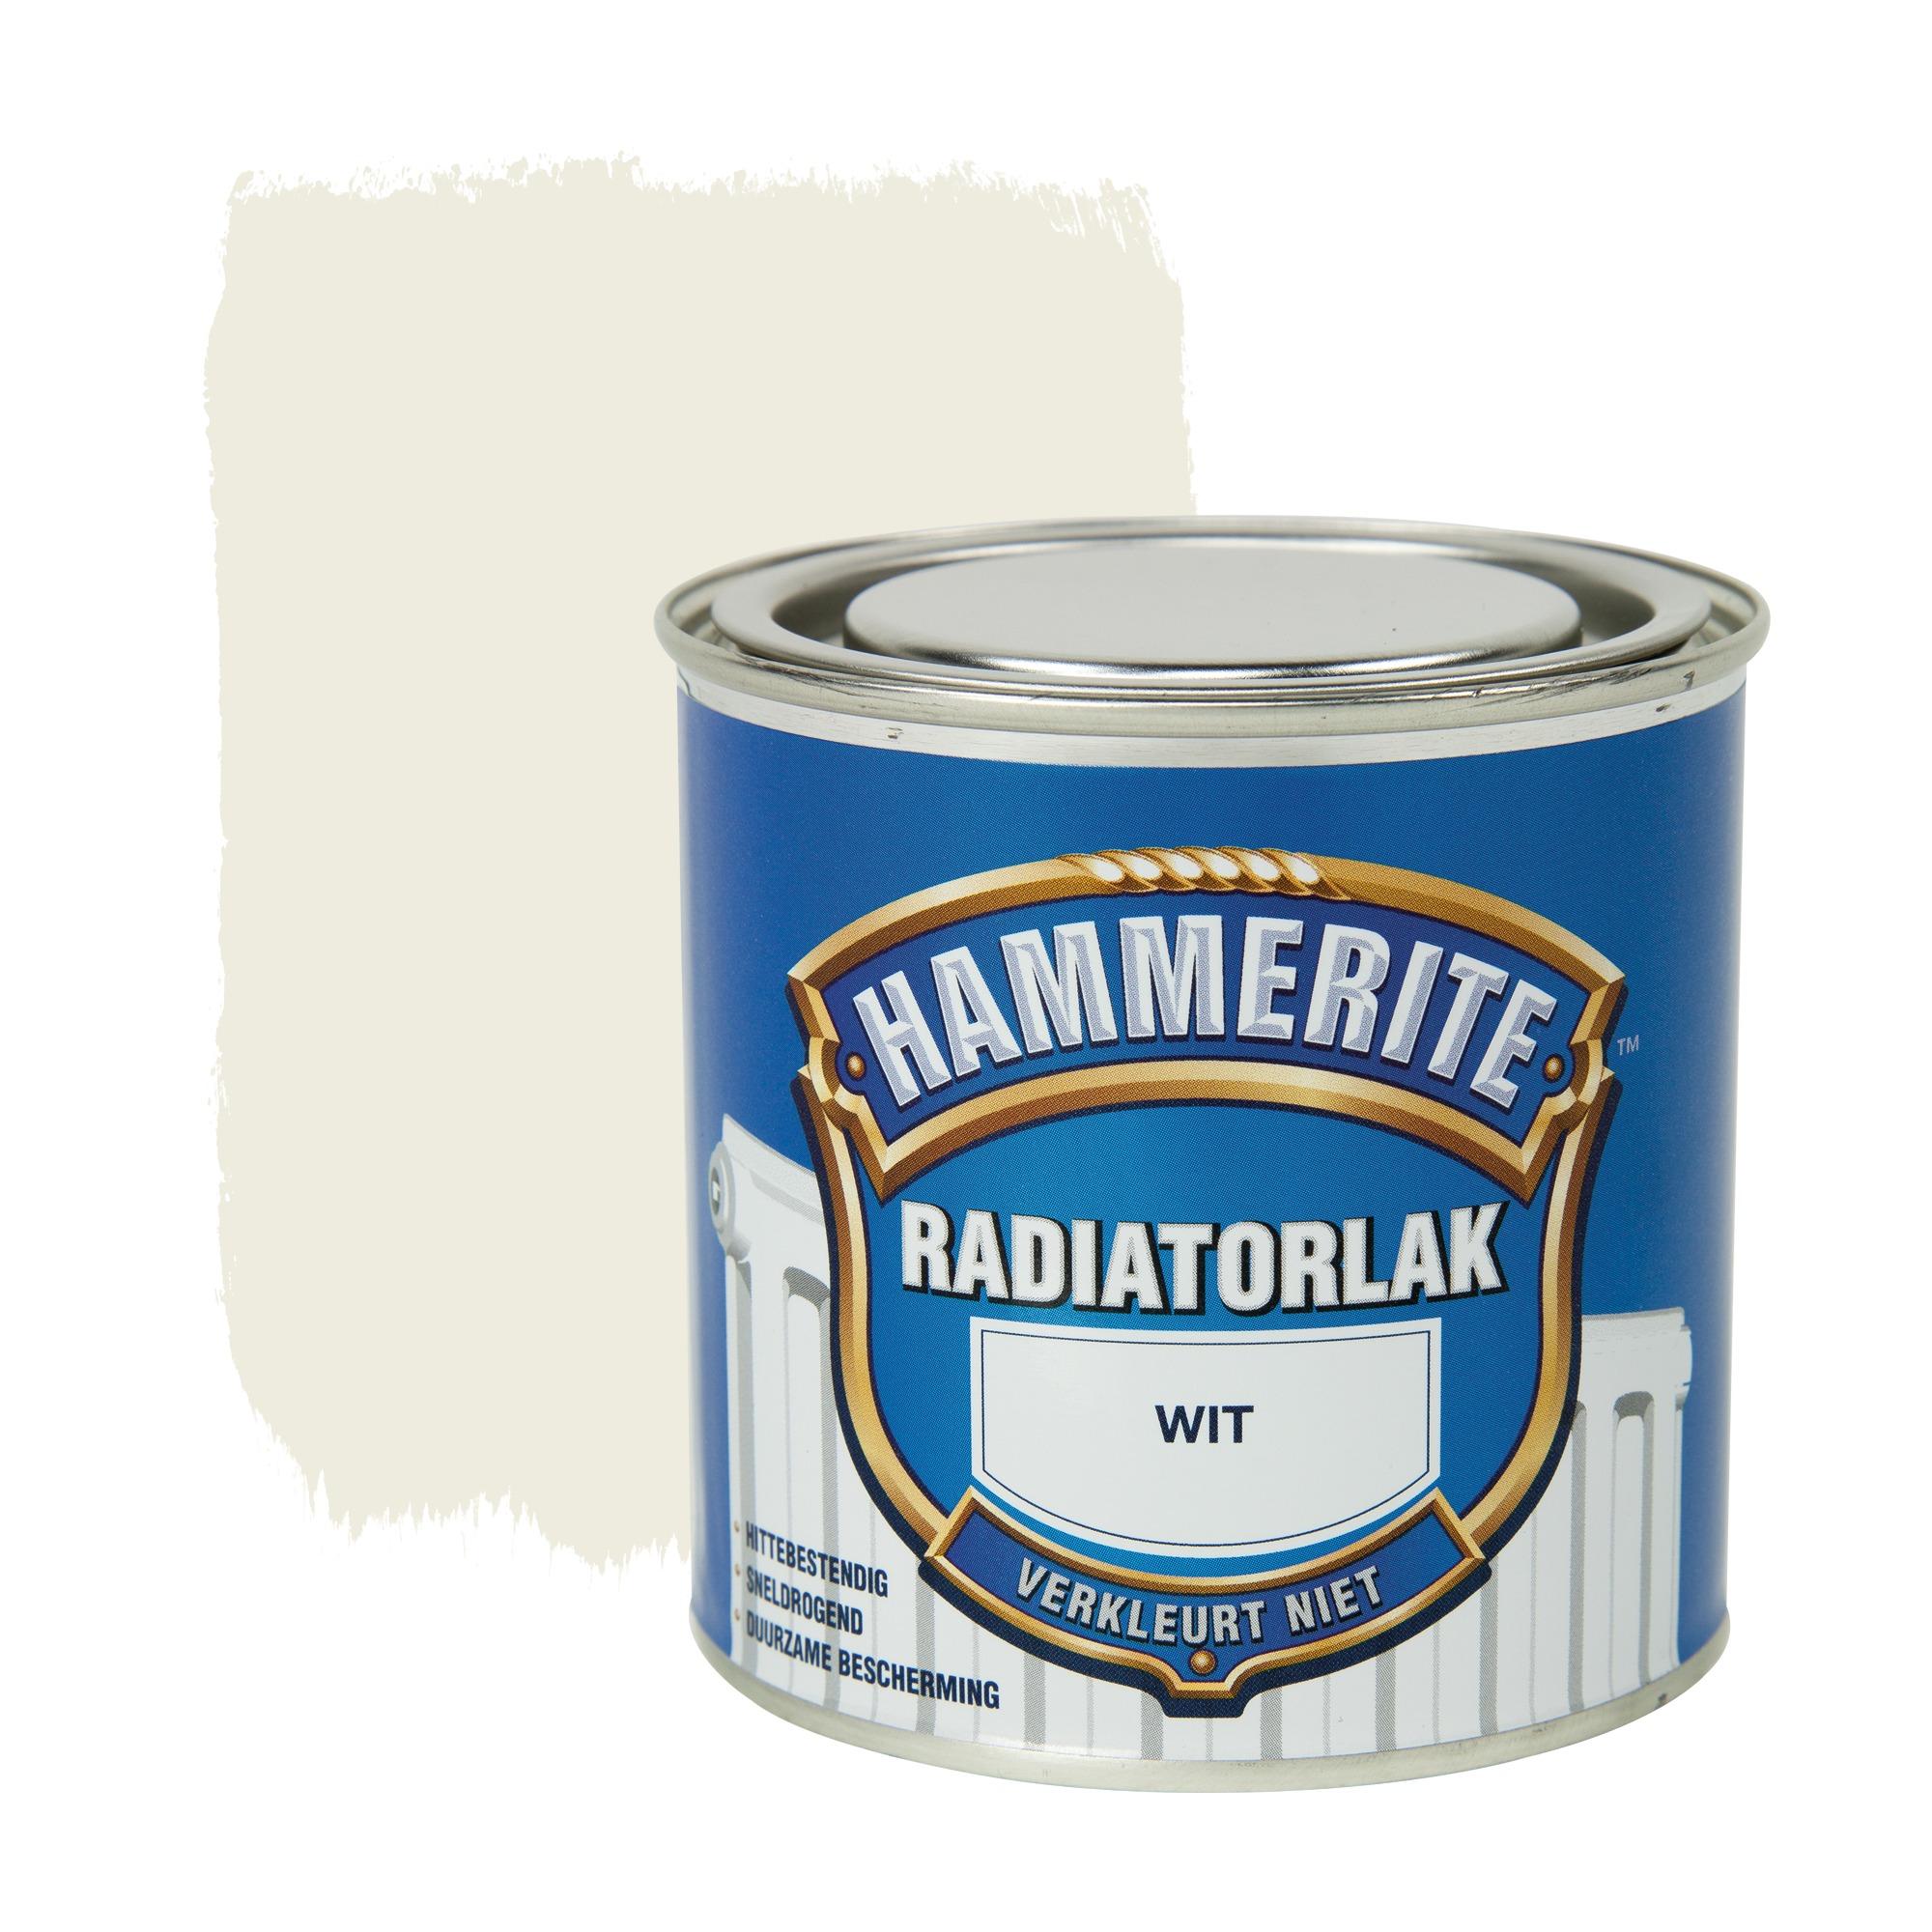 Hammerite radiatorlak wit hoogglans 250 ml   Radiatorlak ...